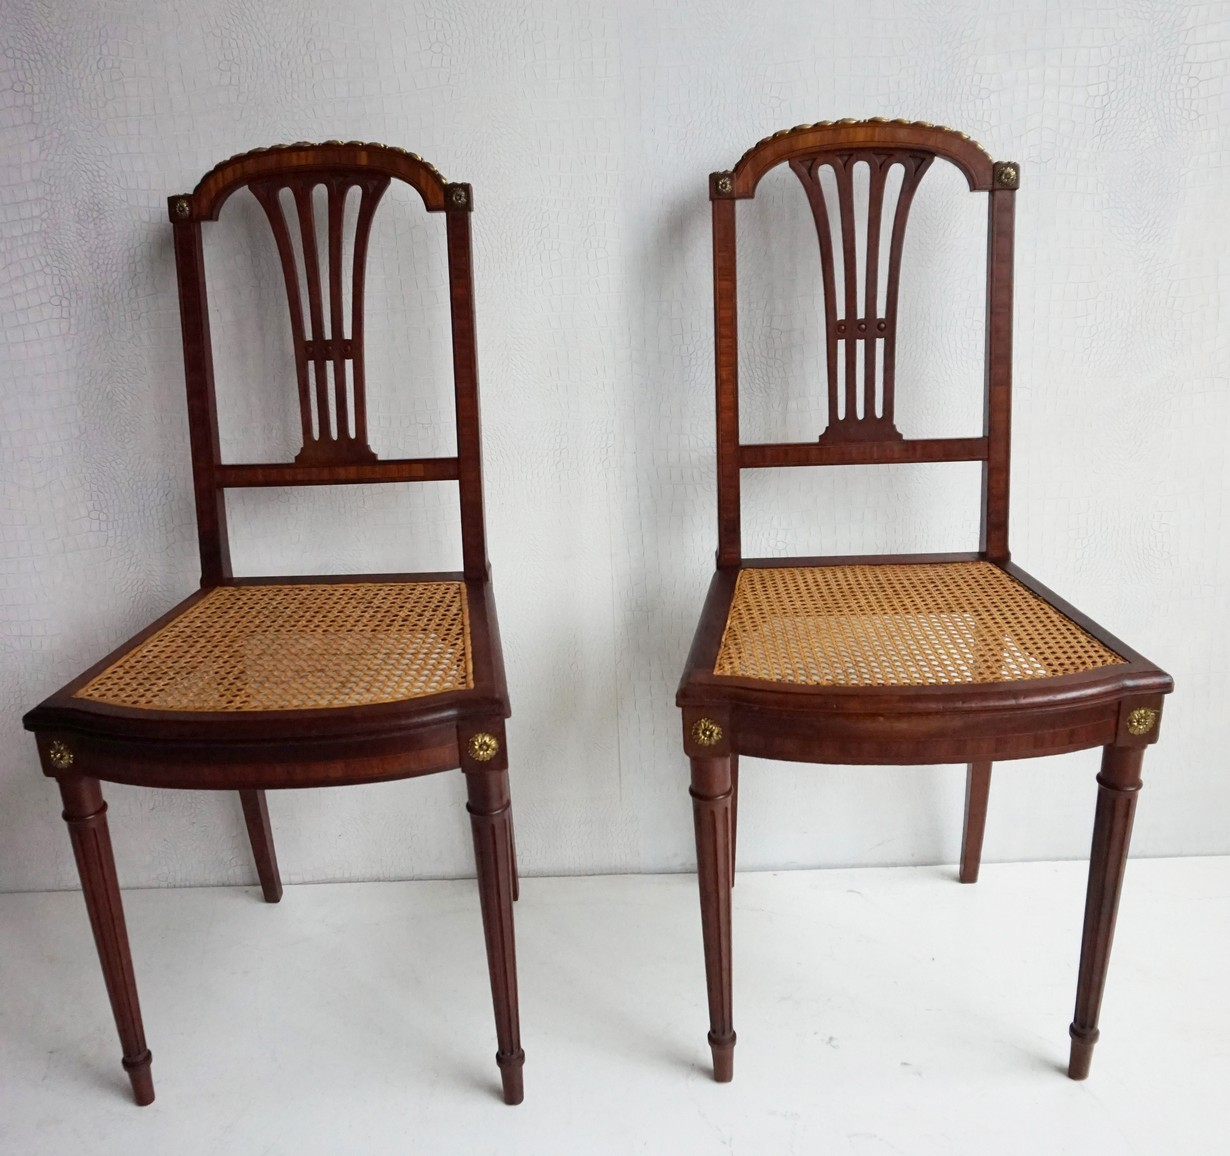 Antique Louis Xvi Mahogany Side Chairs